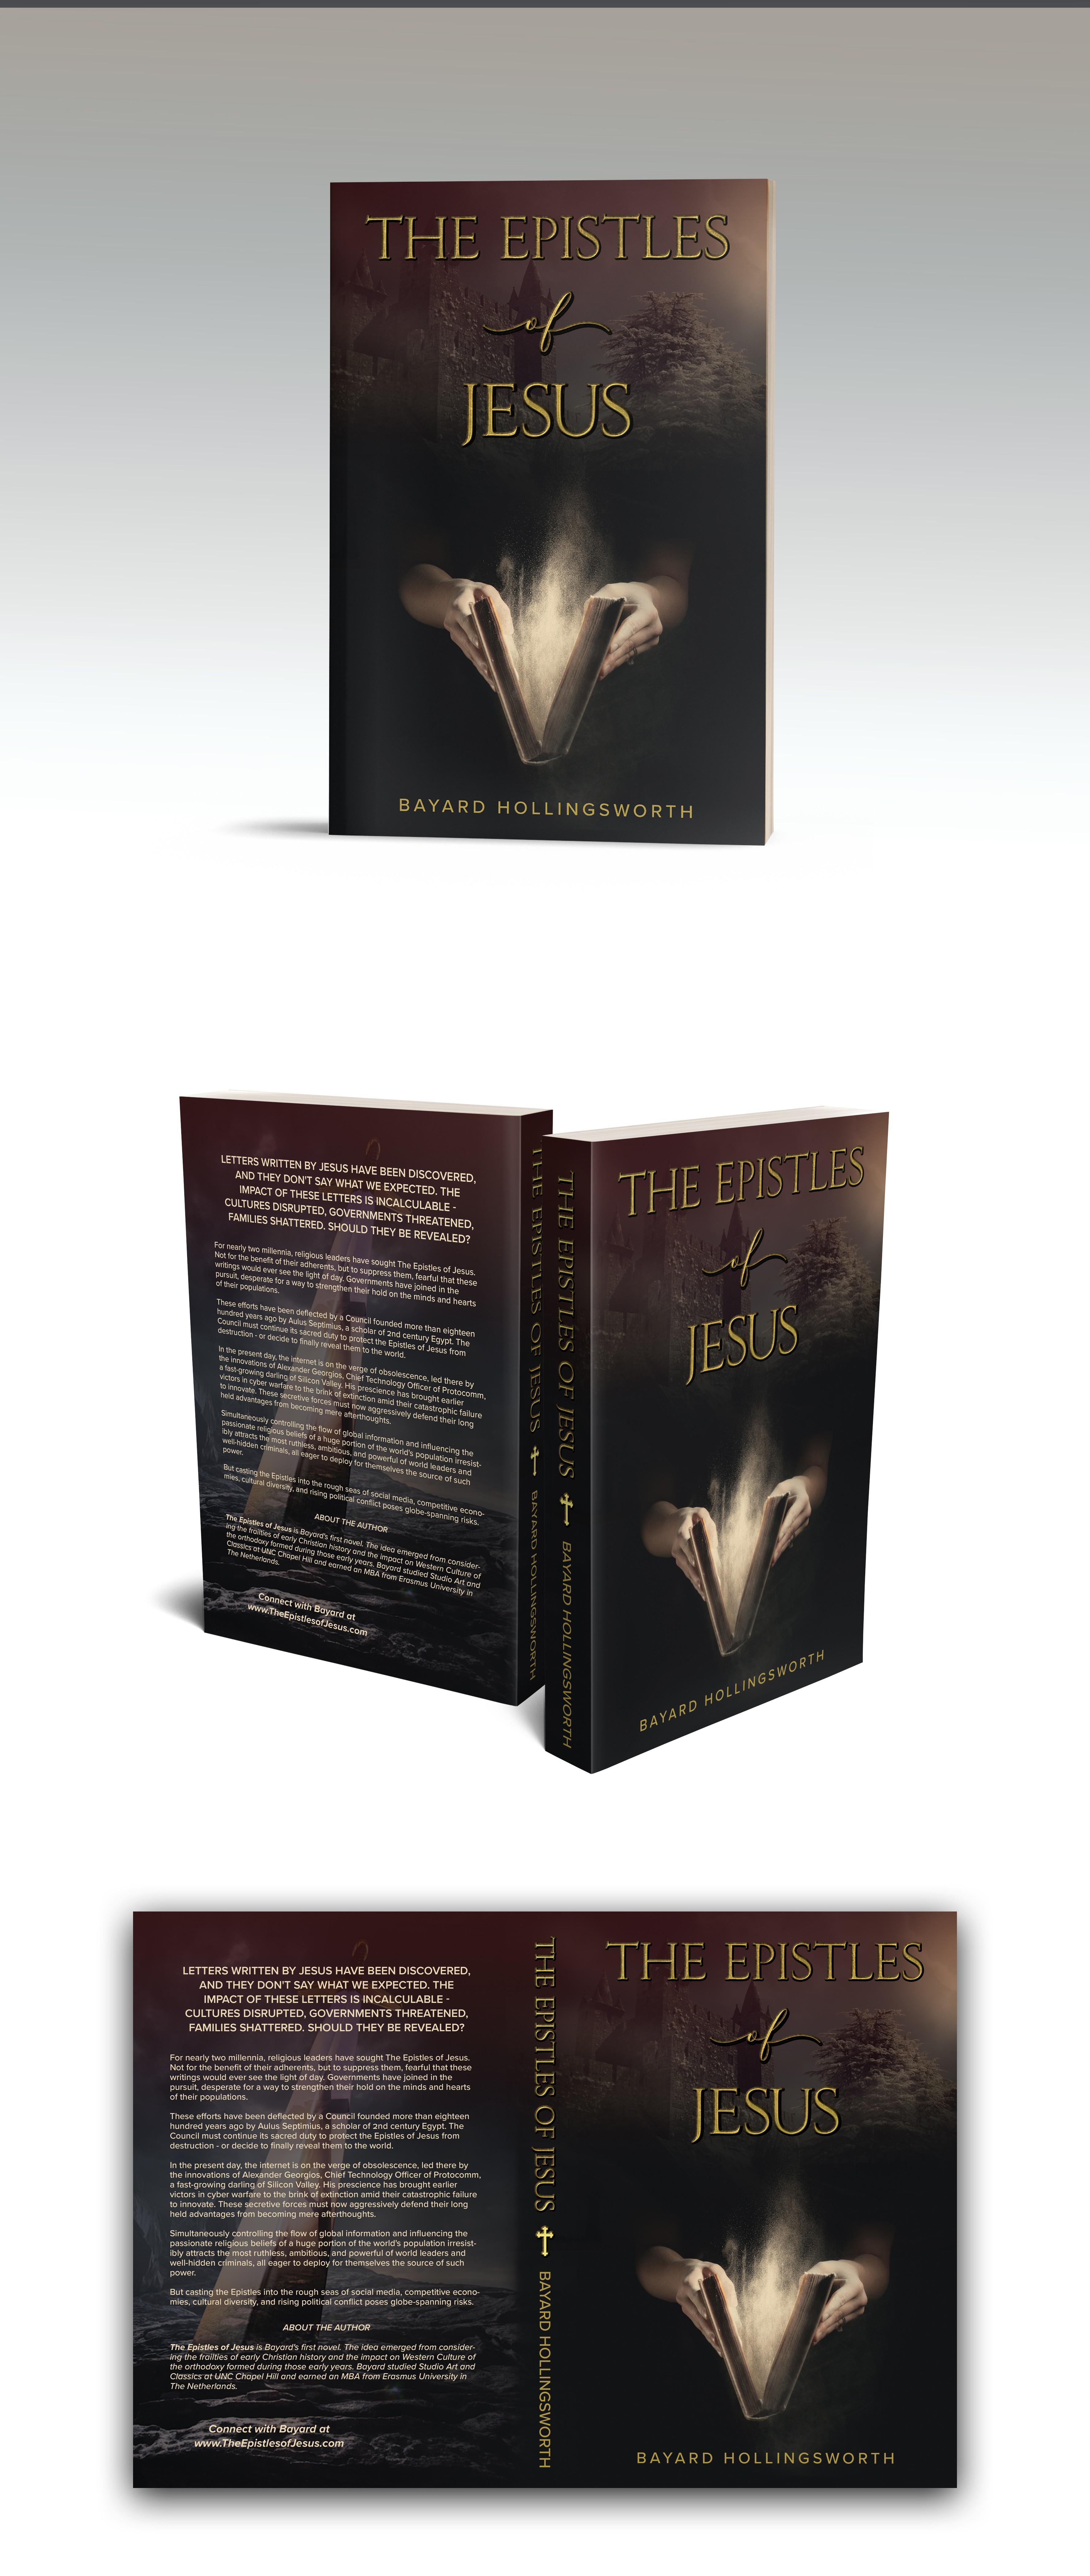 The Epistles of Jesus